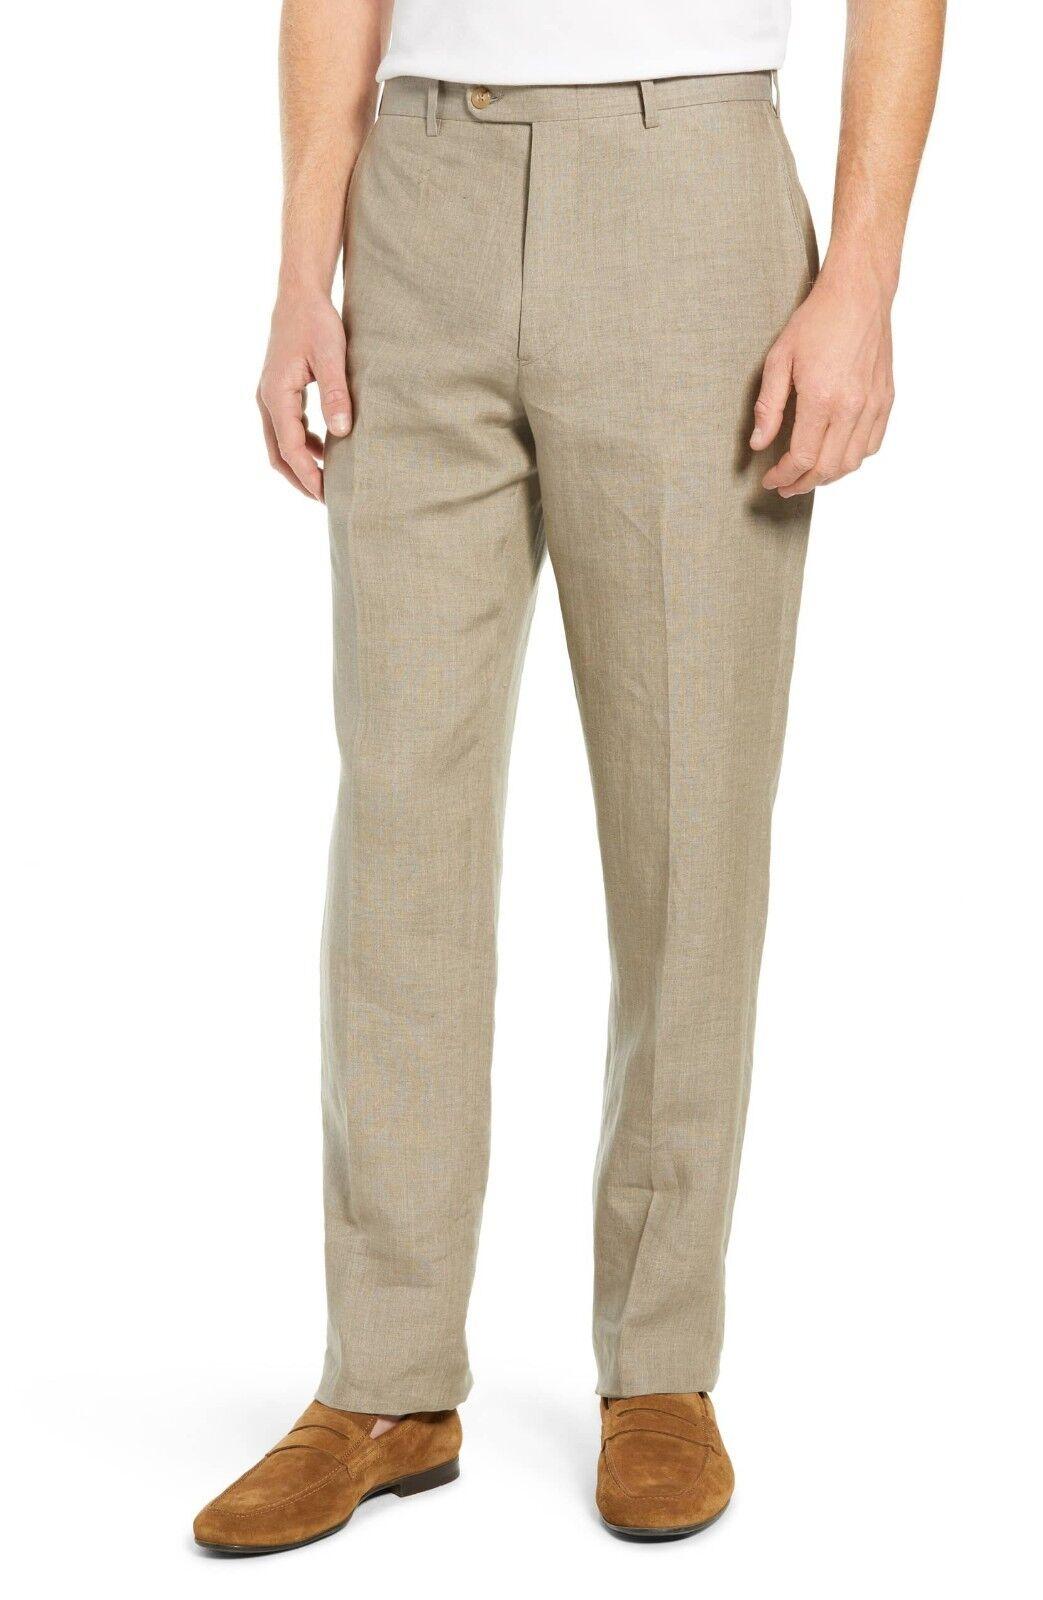 John W Nordstrom Mens Pants Beige Linen Flat Front Ormezzano Casual Career 34 R